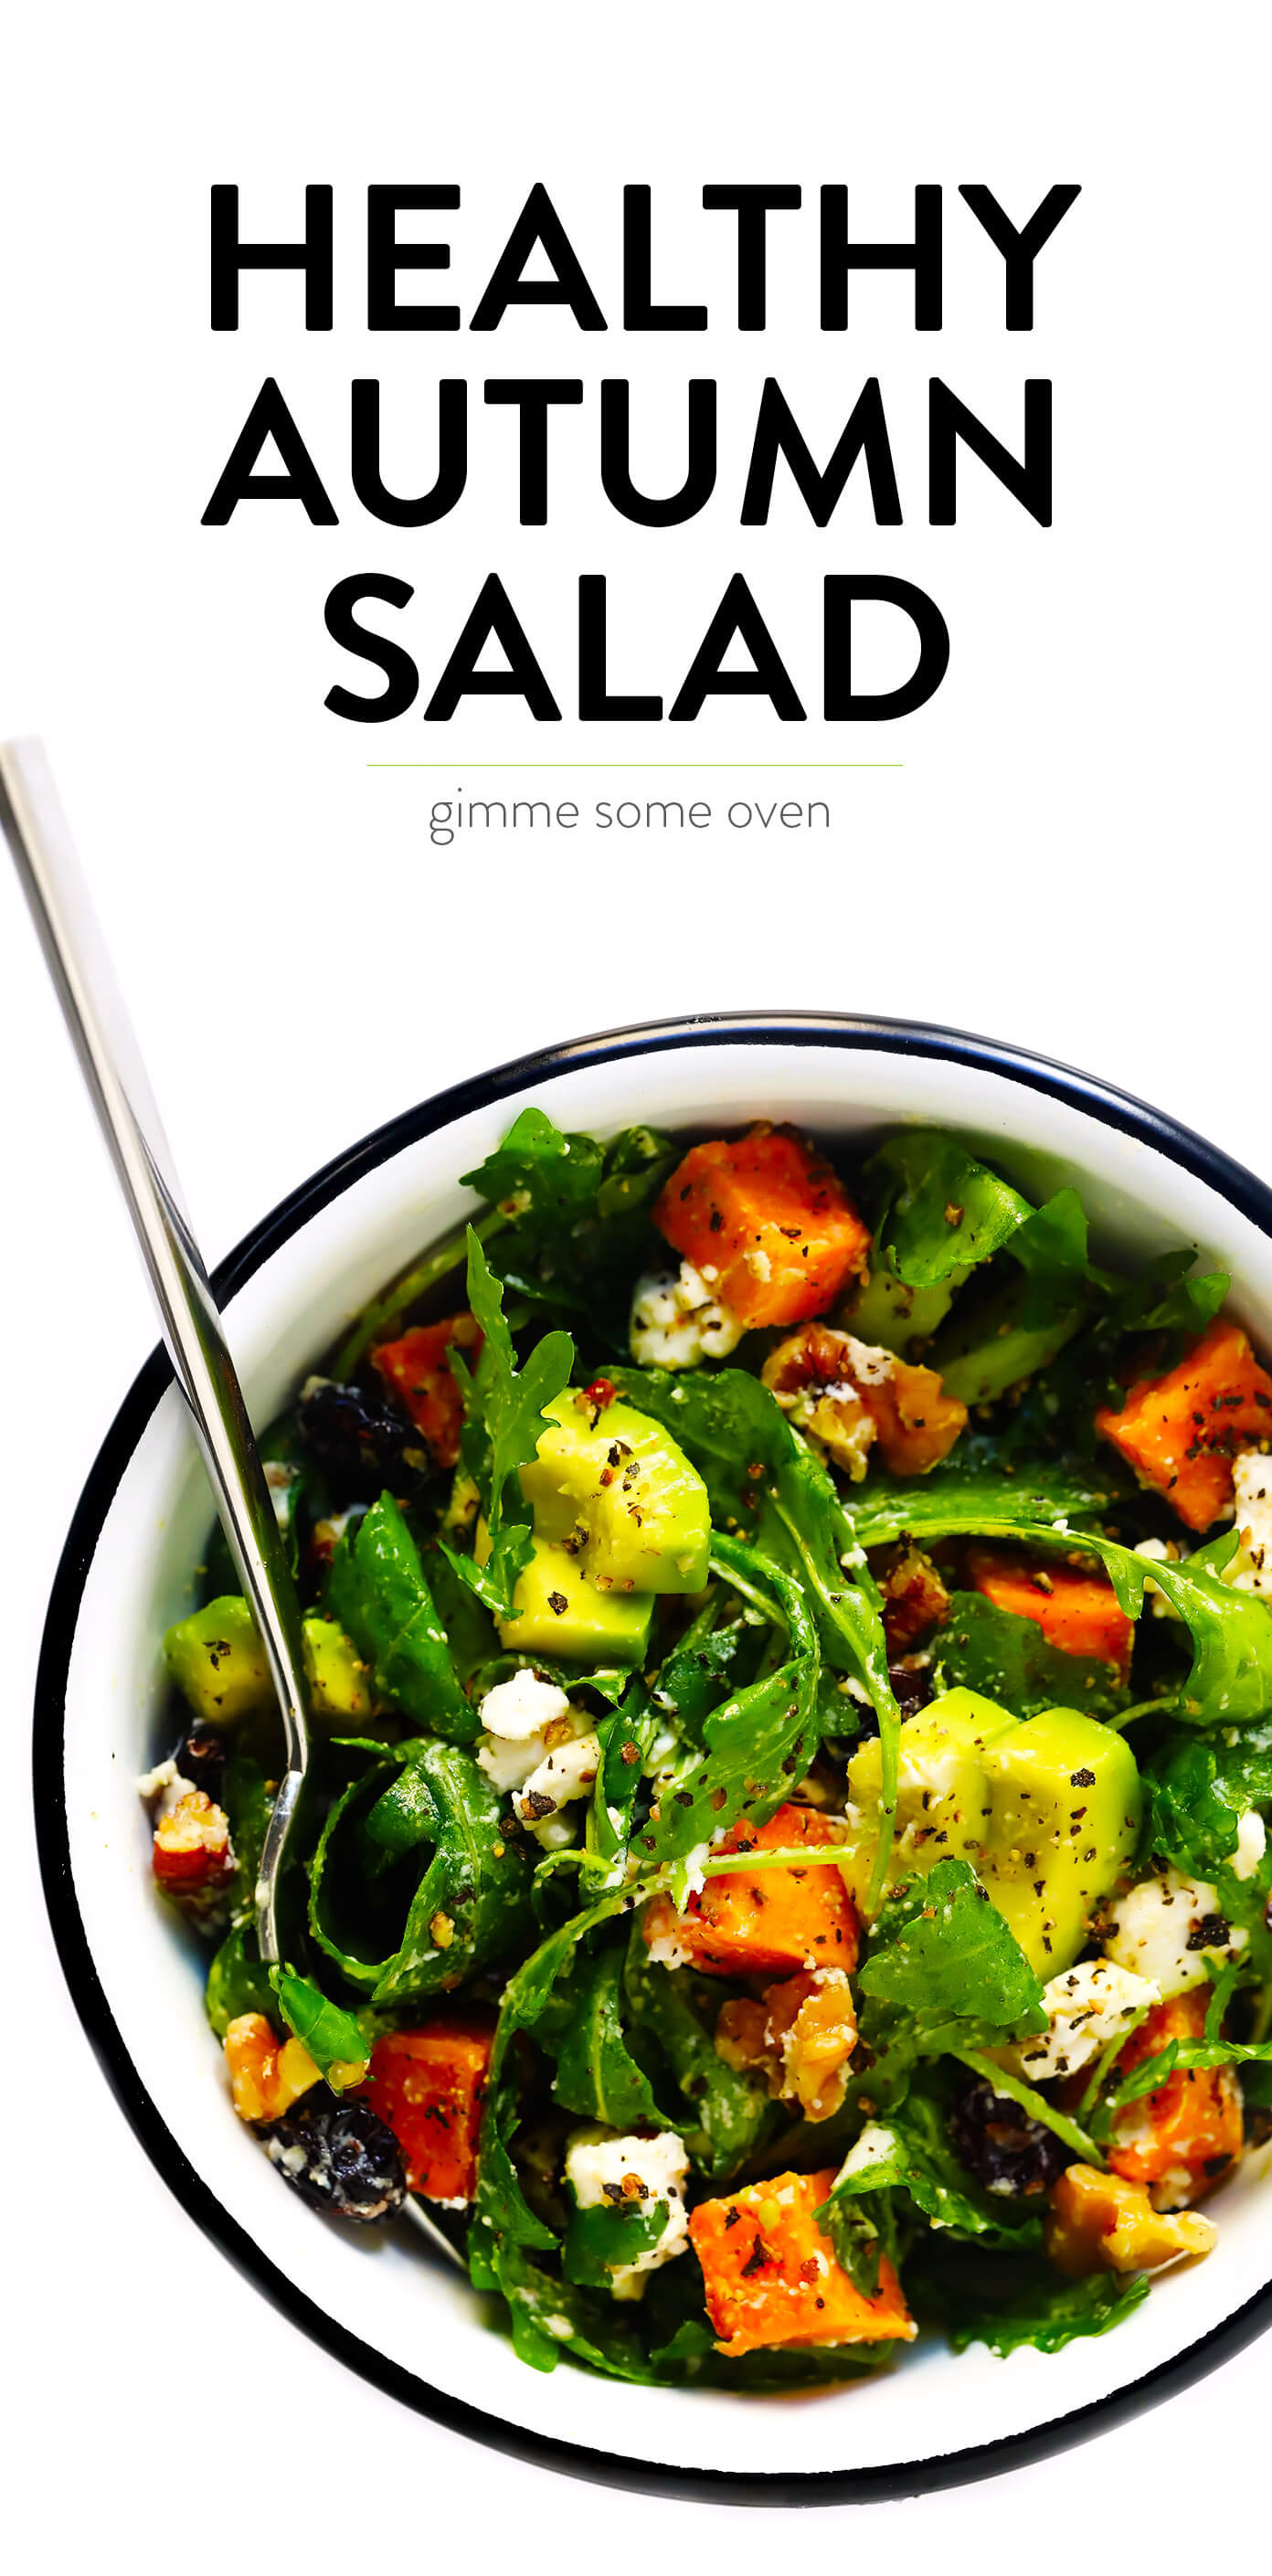 Healthy Autumn Harvest Salad Recipe with Sweet Potato, Avocado, Goat Cheese and Lemon Dressing